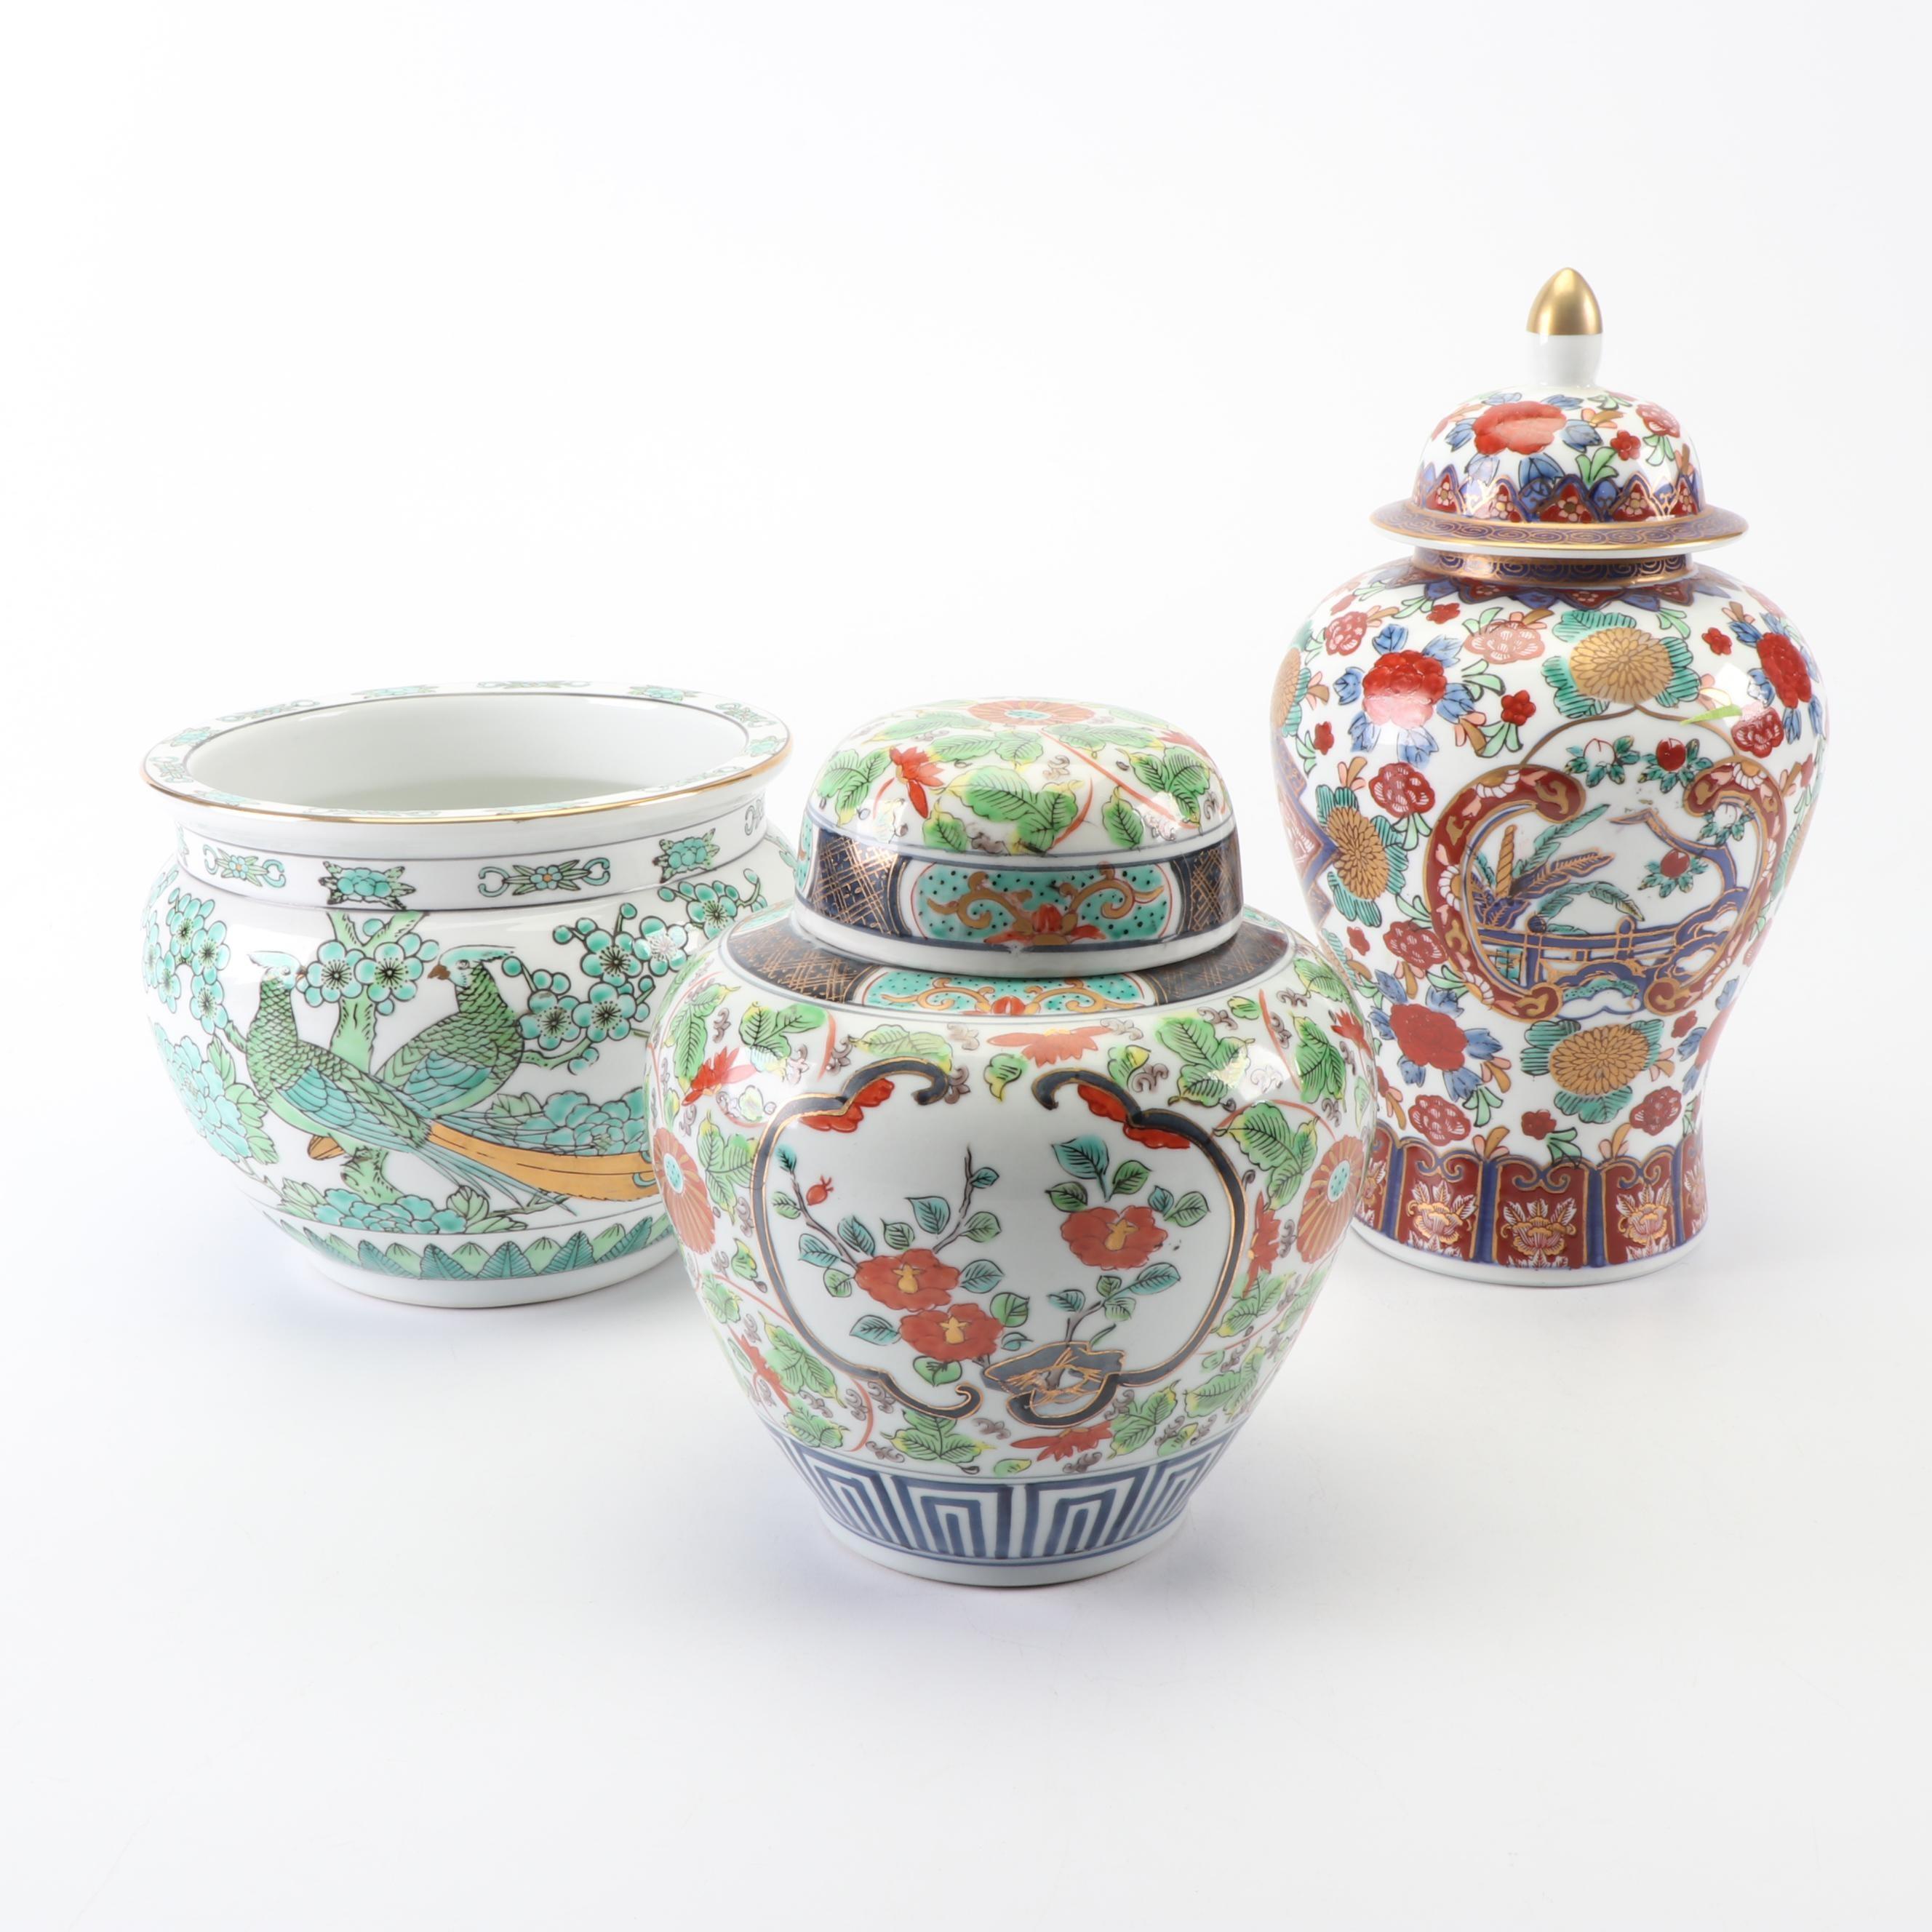 LJ Japanese Porcelain Ginger Jars and Planter